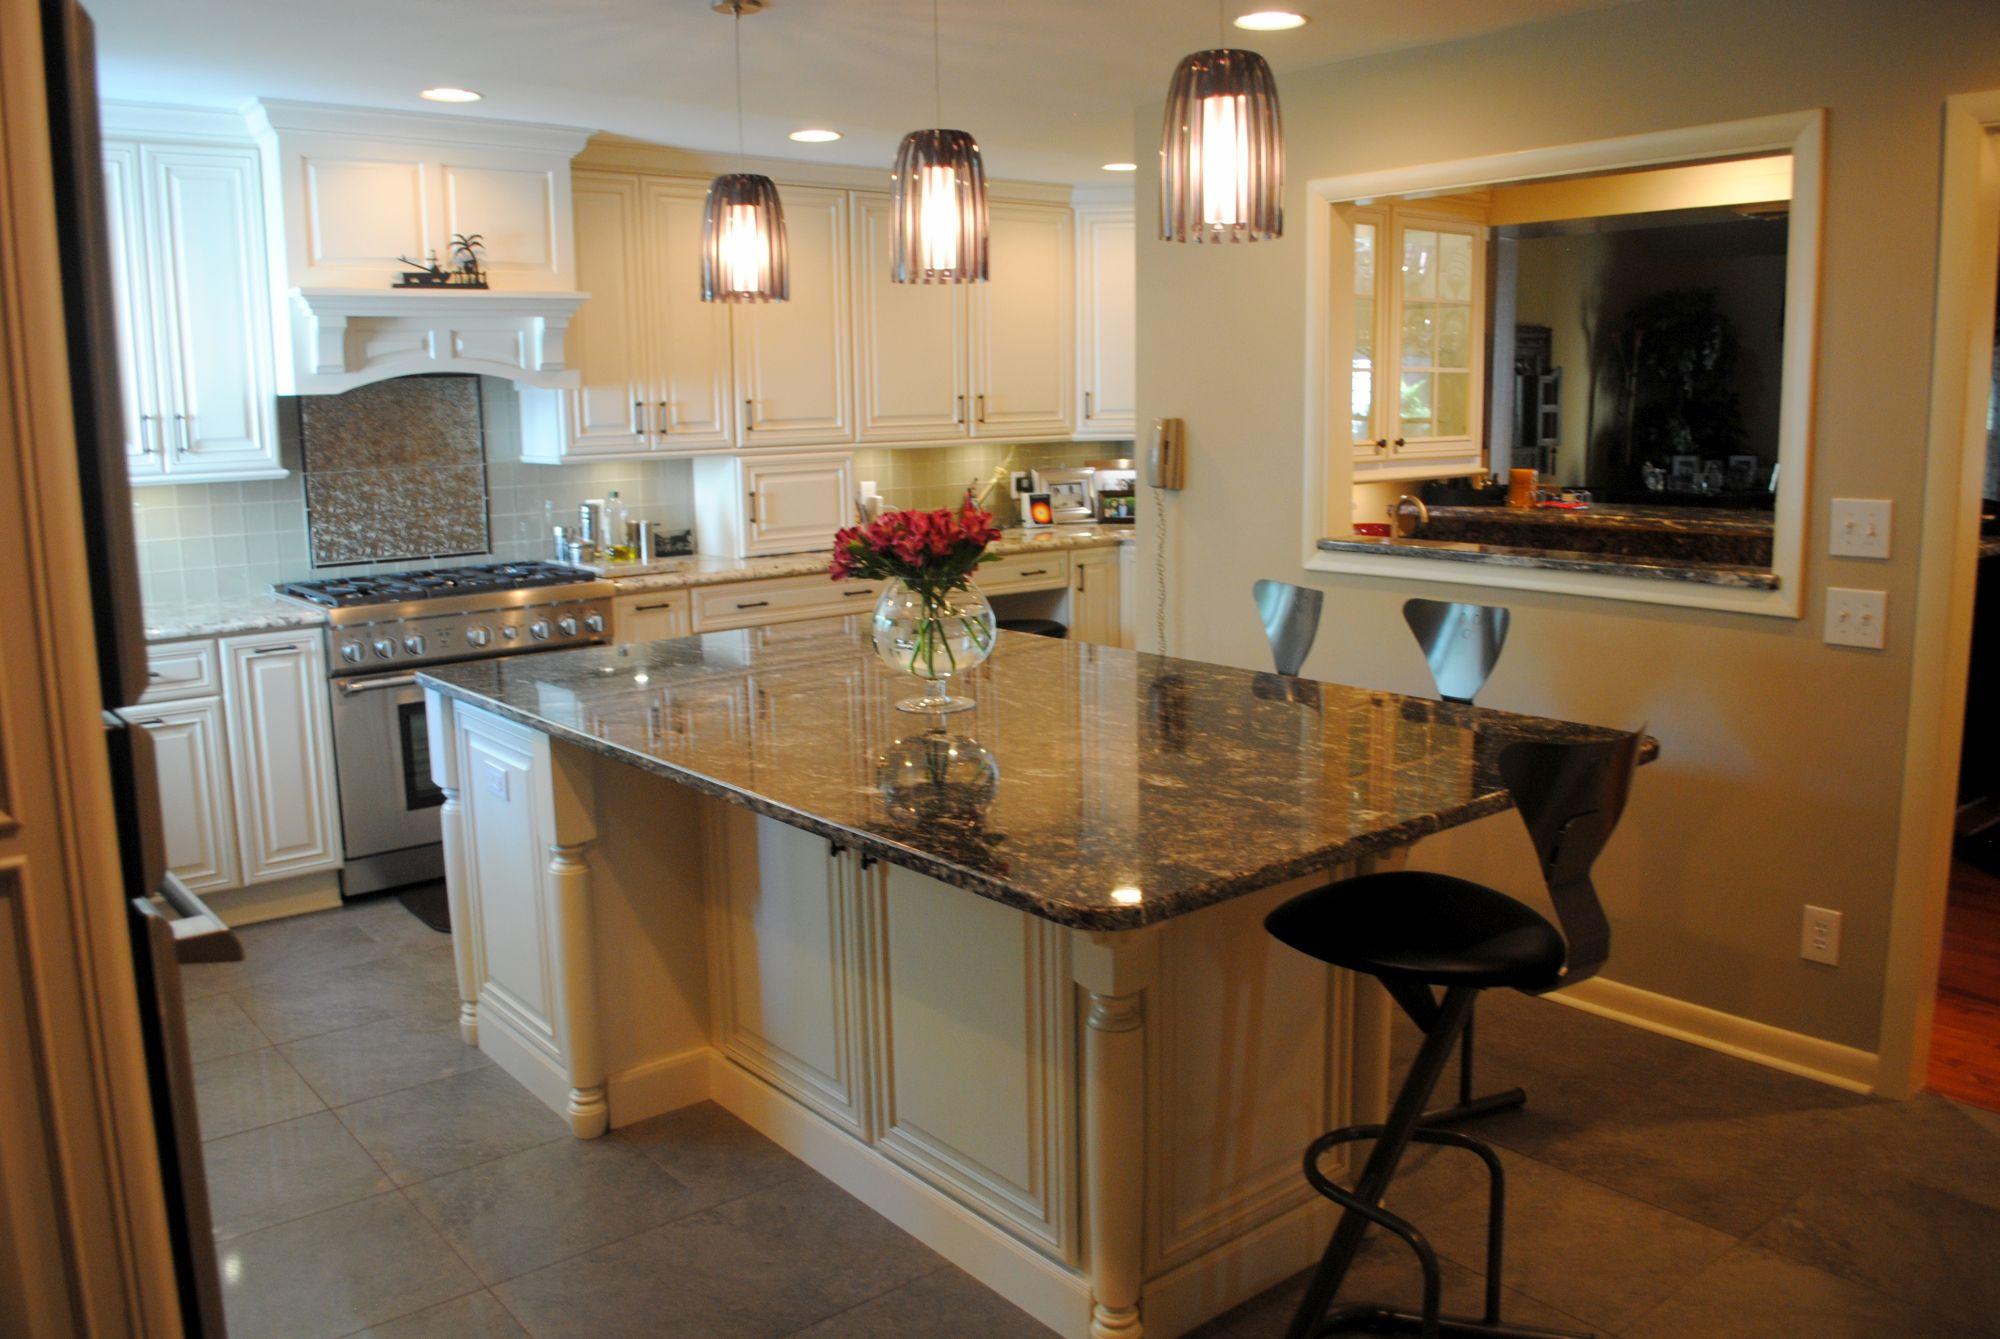 hebbar kitchen showroom daniel island sc mevers custom kitchens llc - Hebbar Kitchen